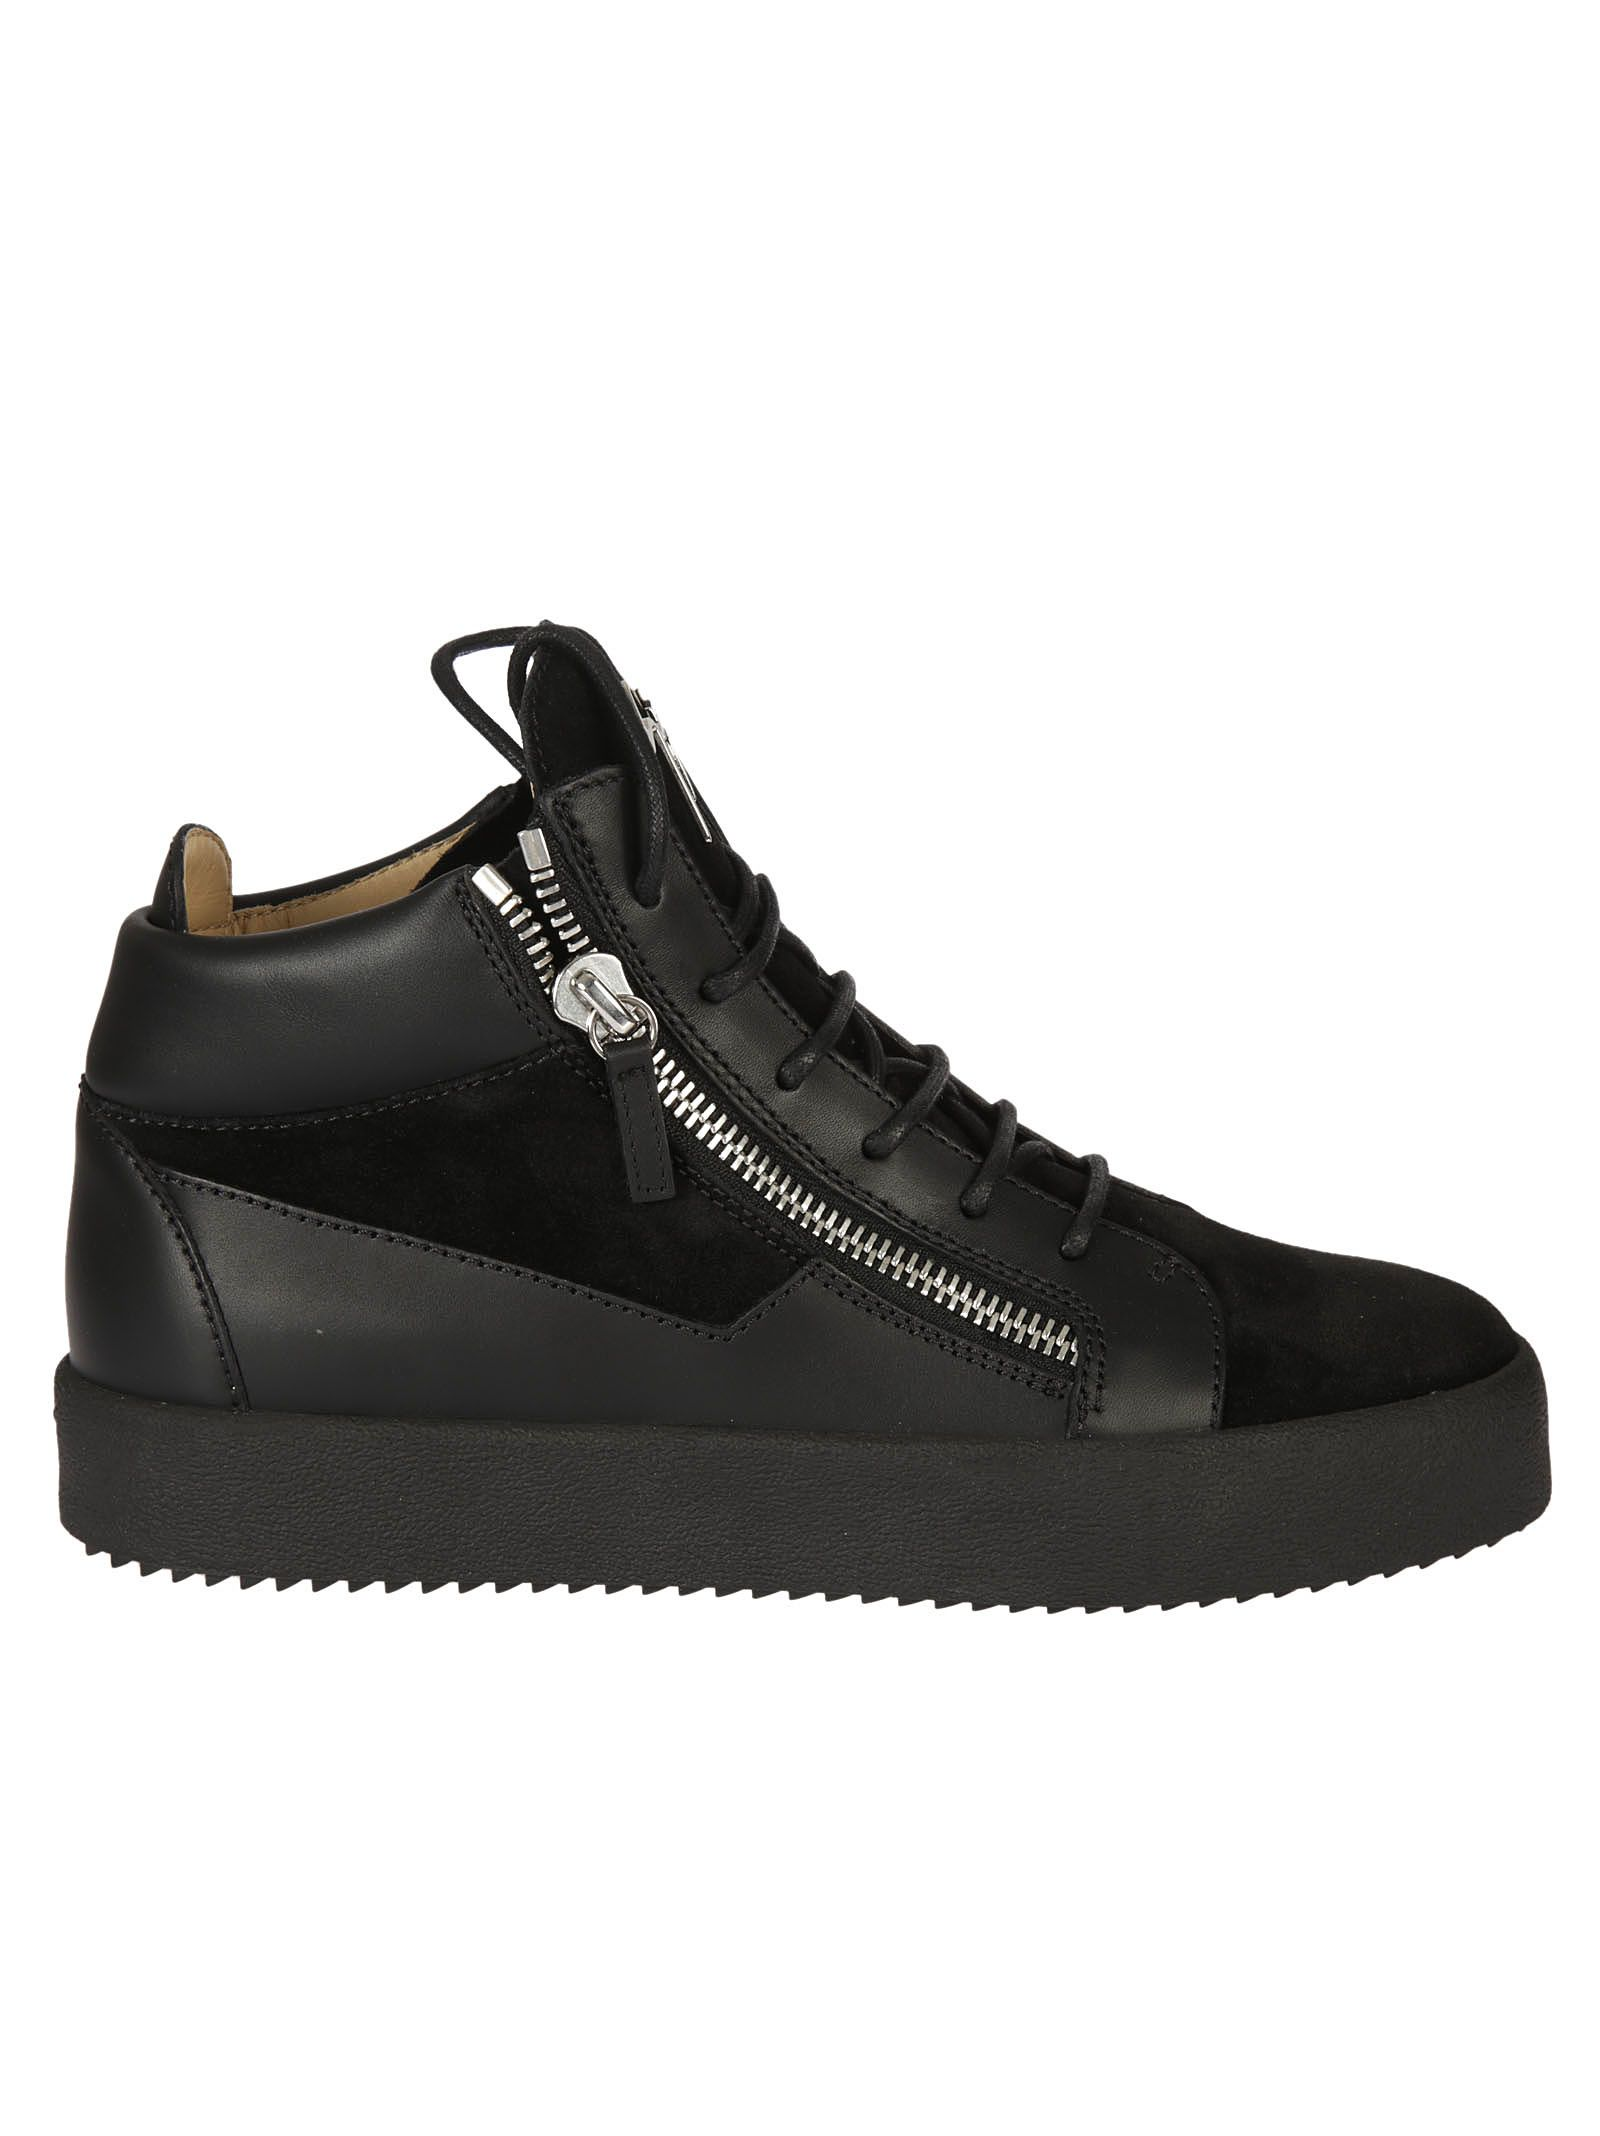 Giuseppe Zanotti Giuseppe Zanotti Kriss Hi-top Sneakers